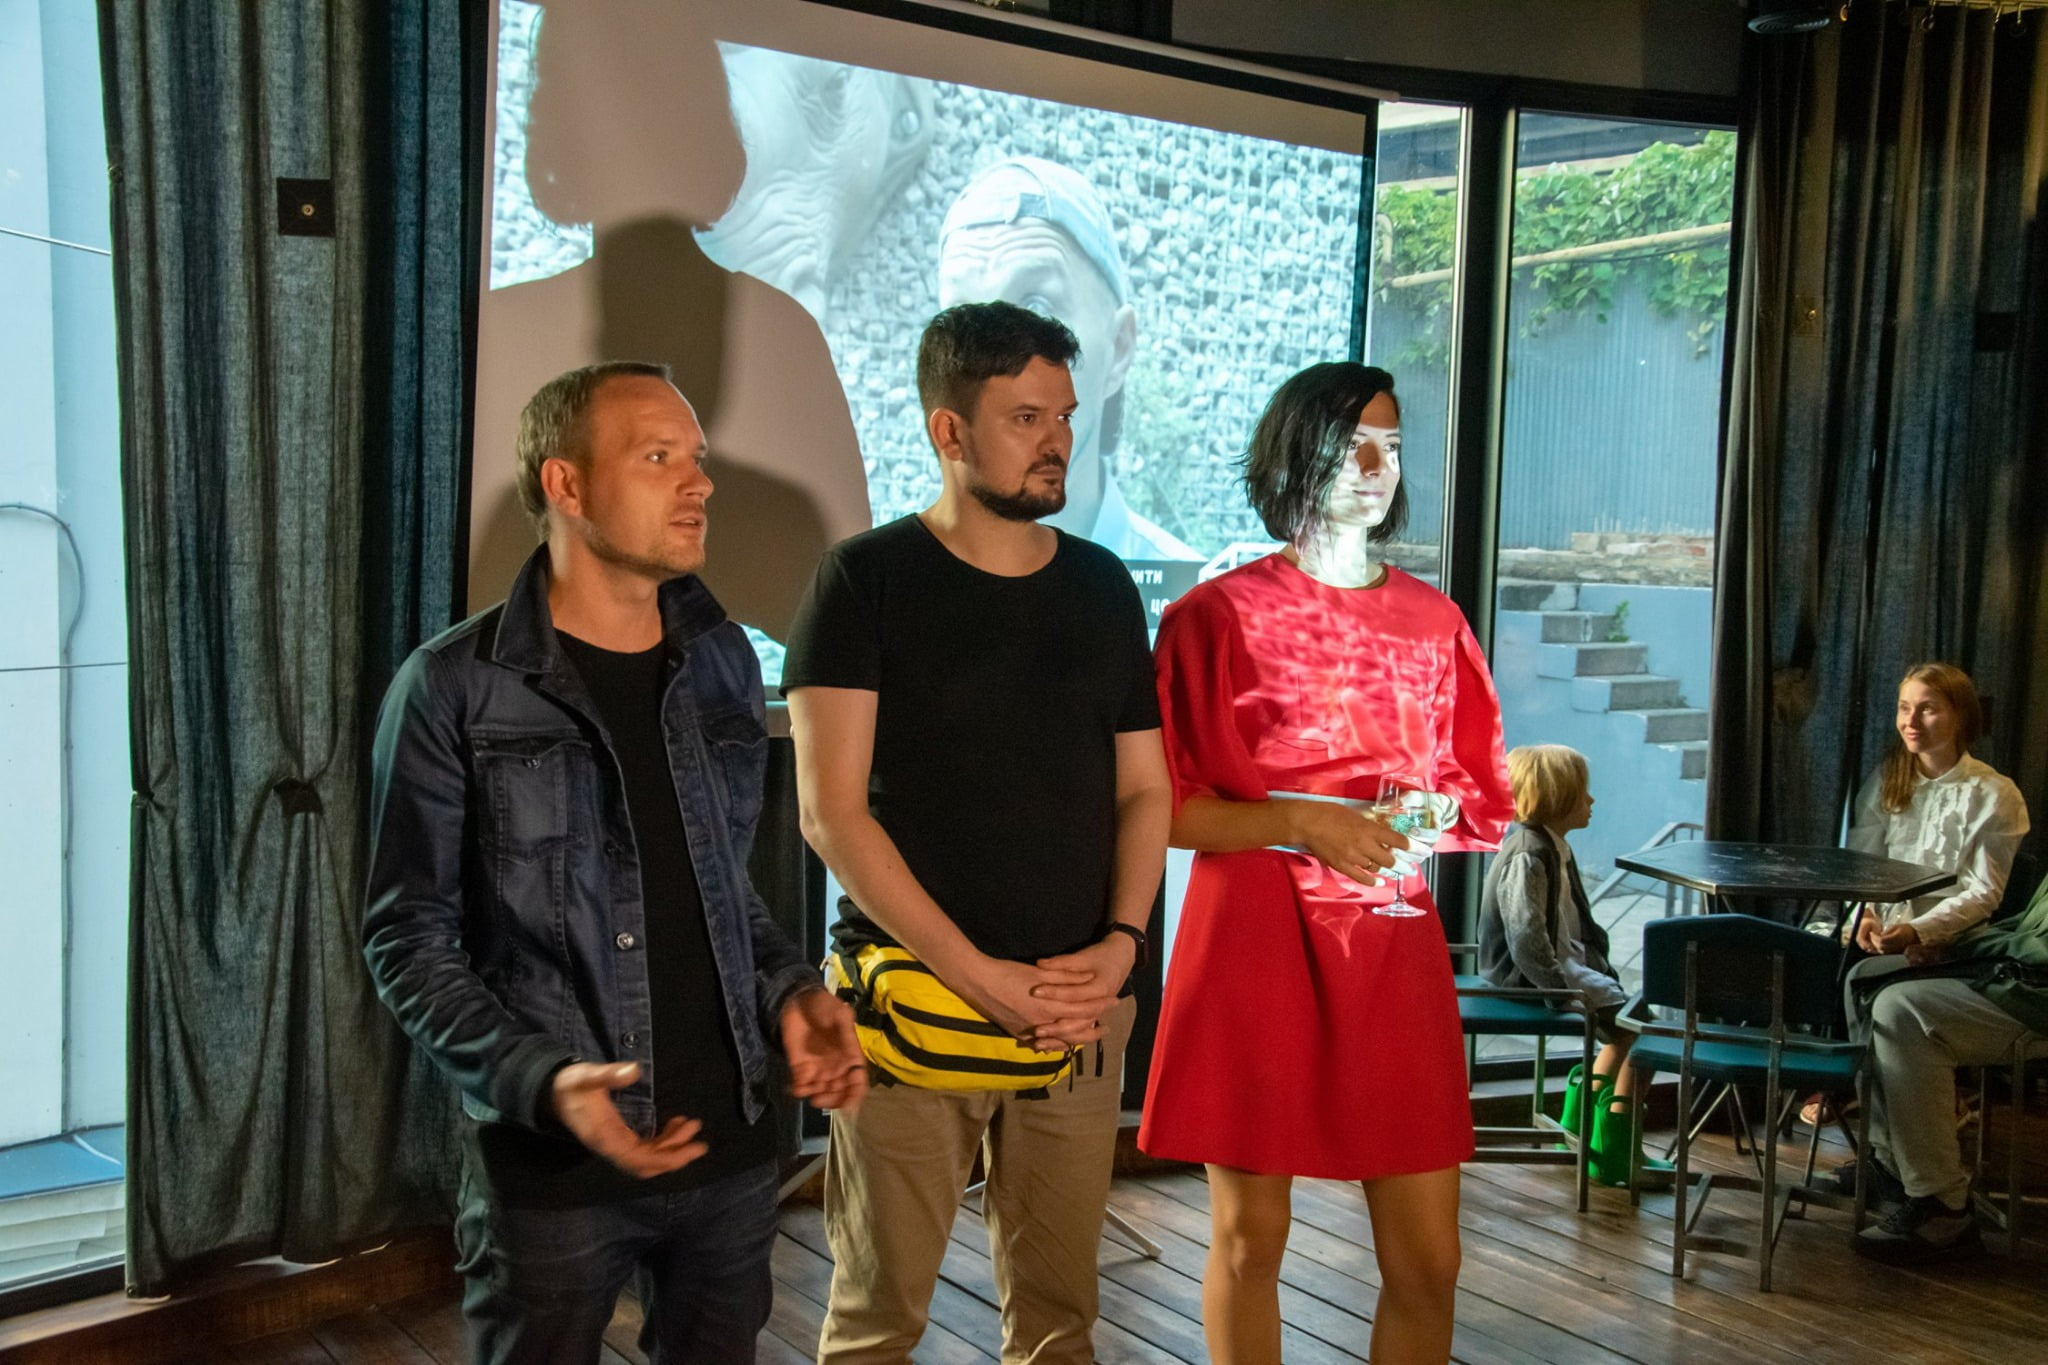 Andrii Sichkovsky, Fedir Boitsov Iana Boitsova Very Digital Residencies